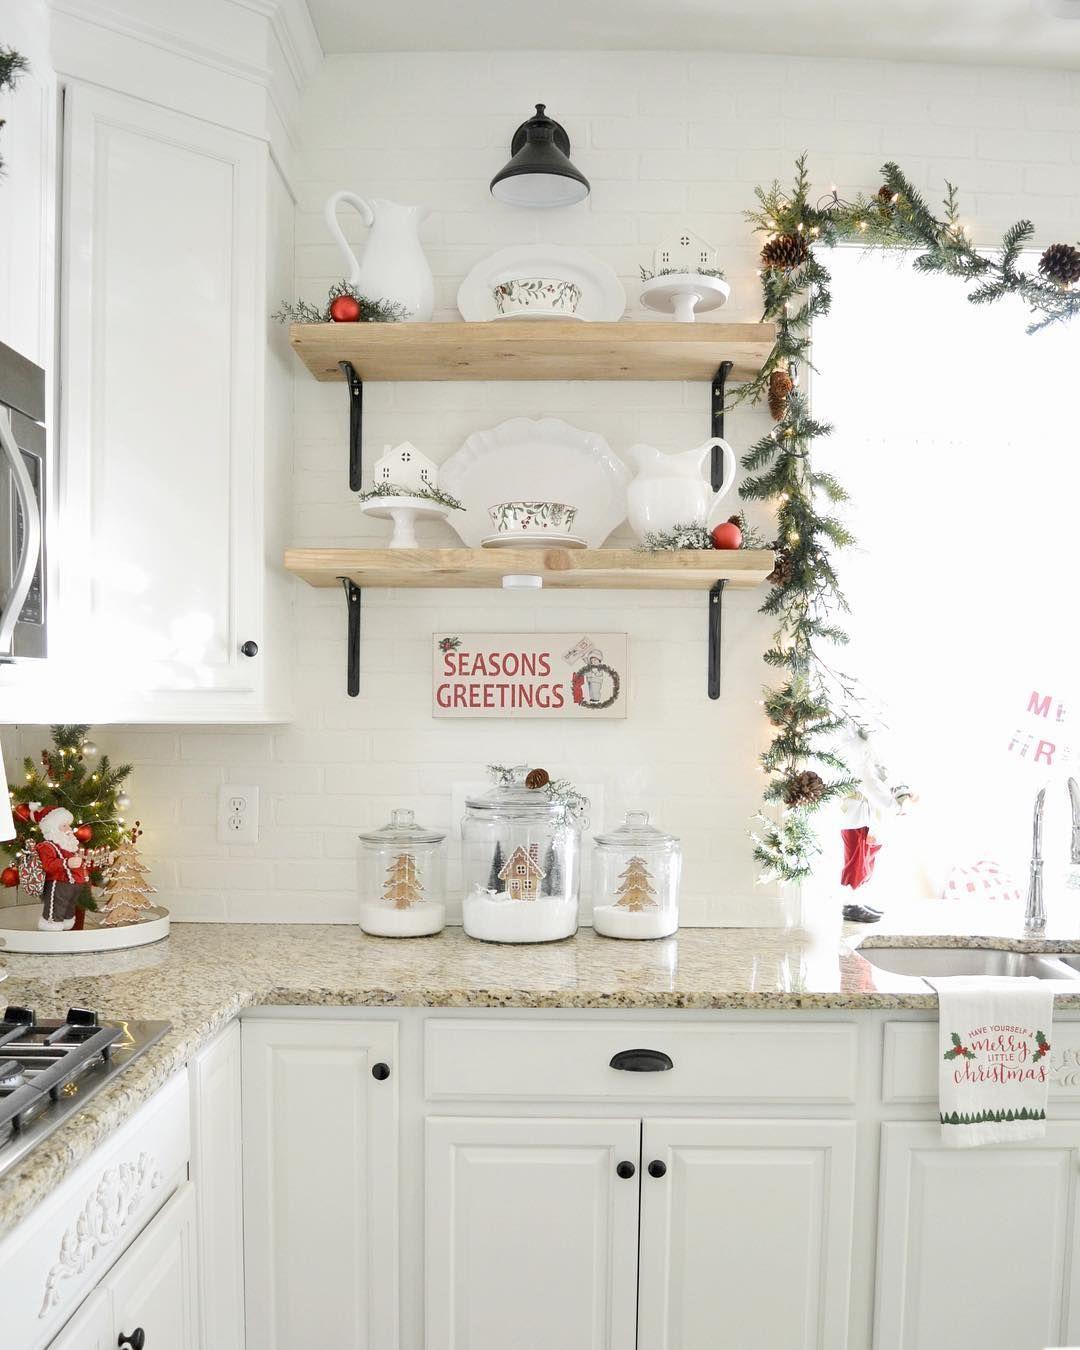 Becca Bertotti On Instagram I Love Having White Kitchen